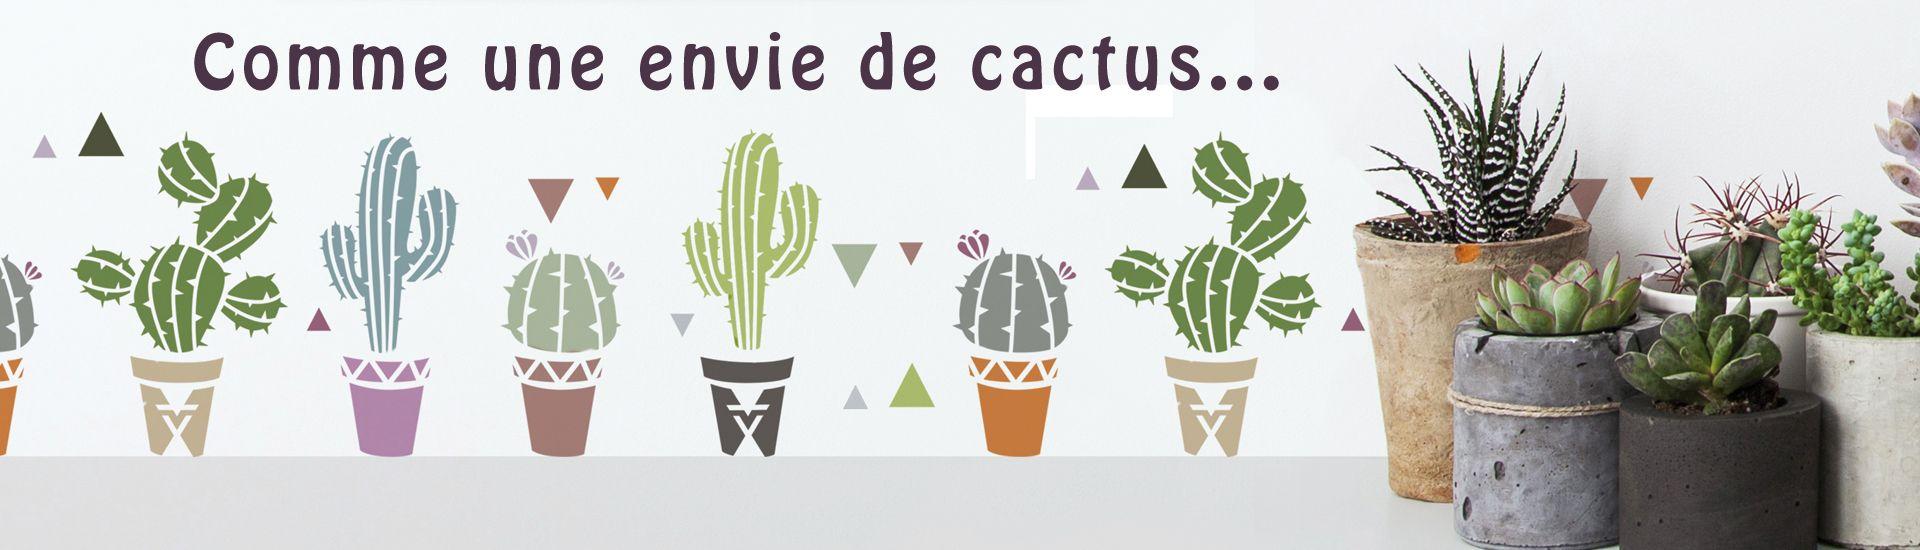 déco cactus